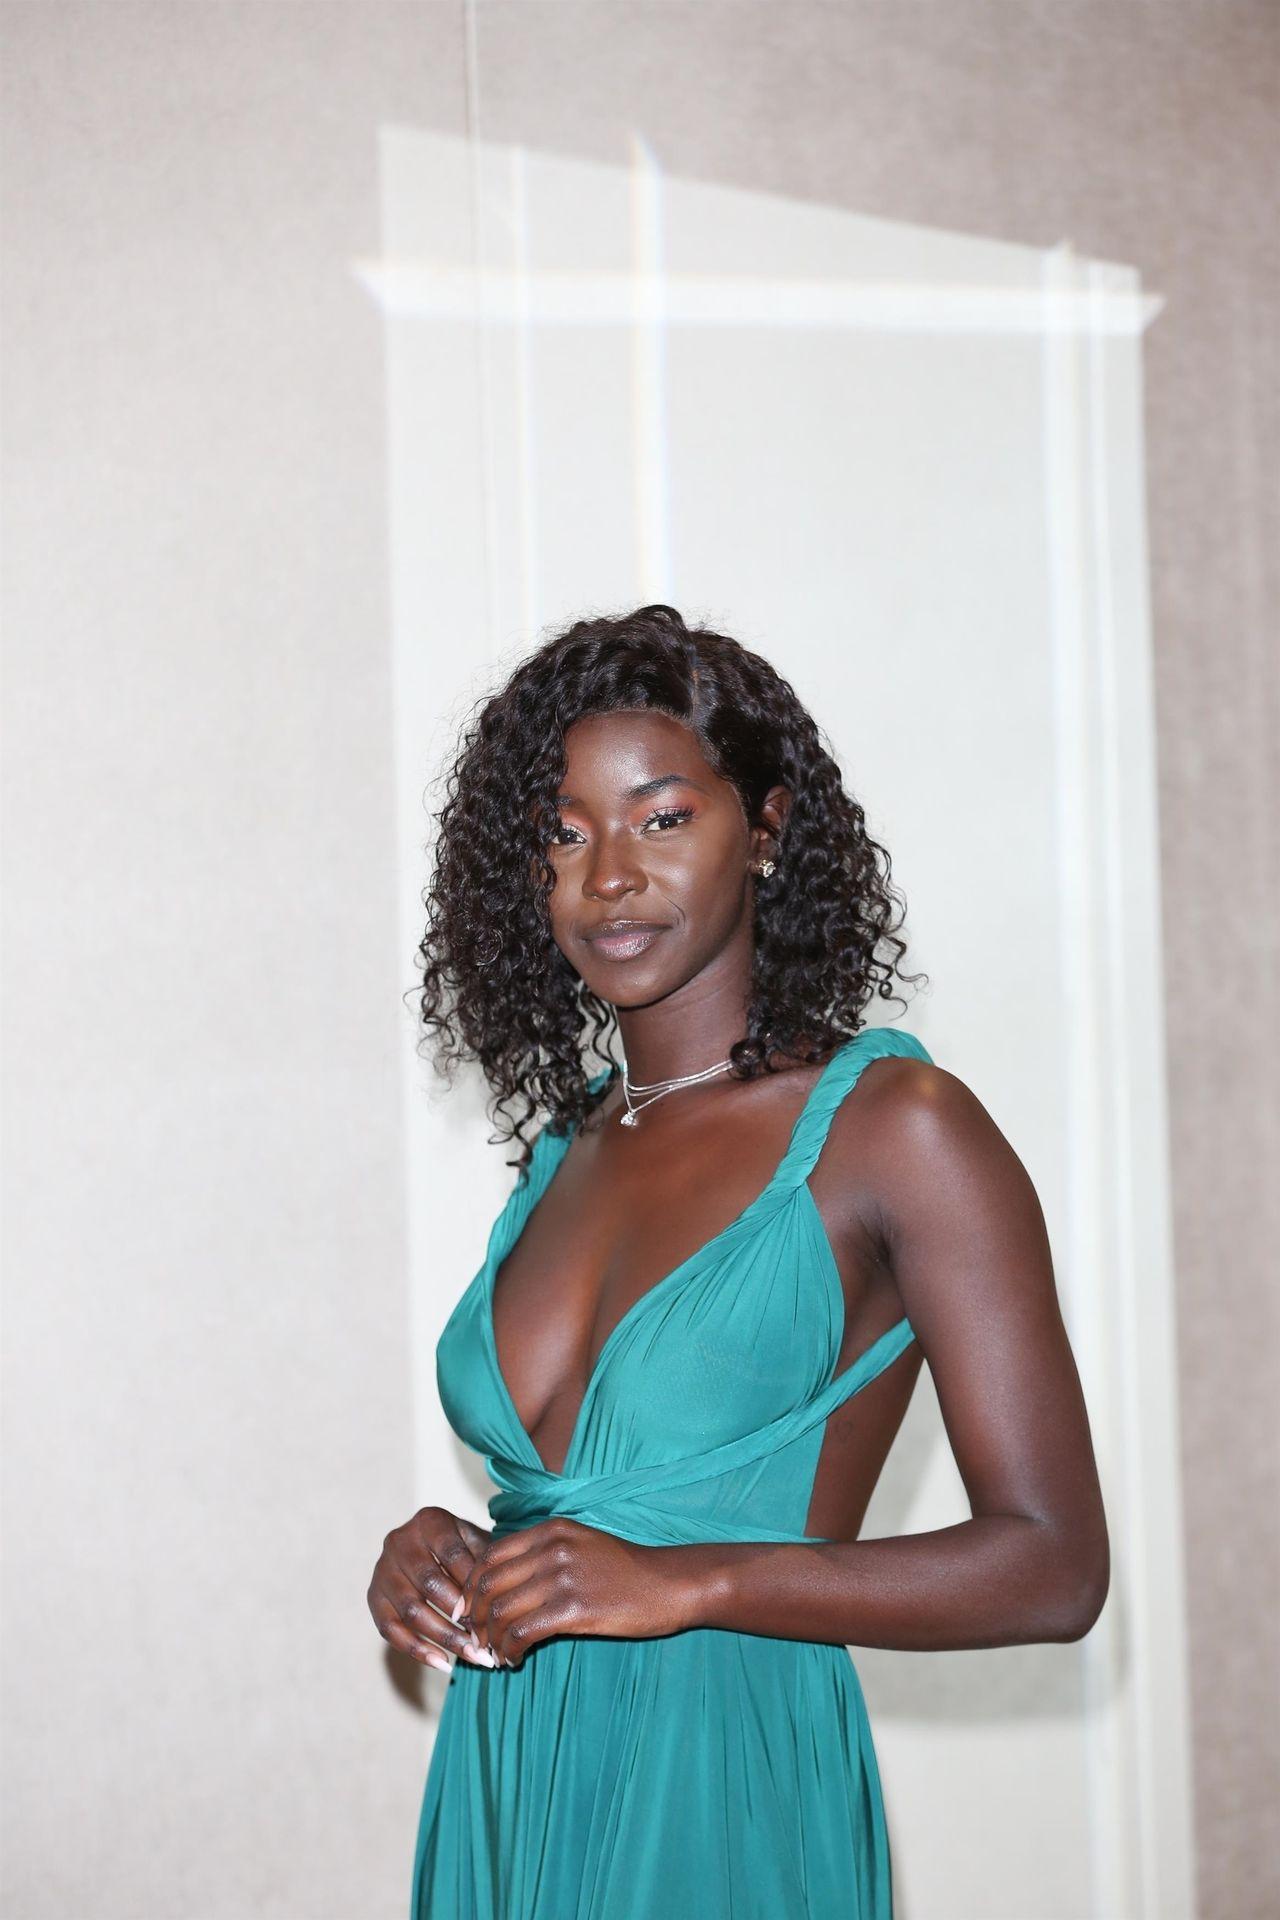 Mike Boateng & Priscilla Anyabu Are Seen At British Ethnic Diversity Sports Awards 0151